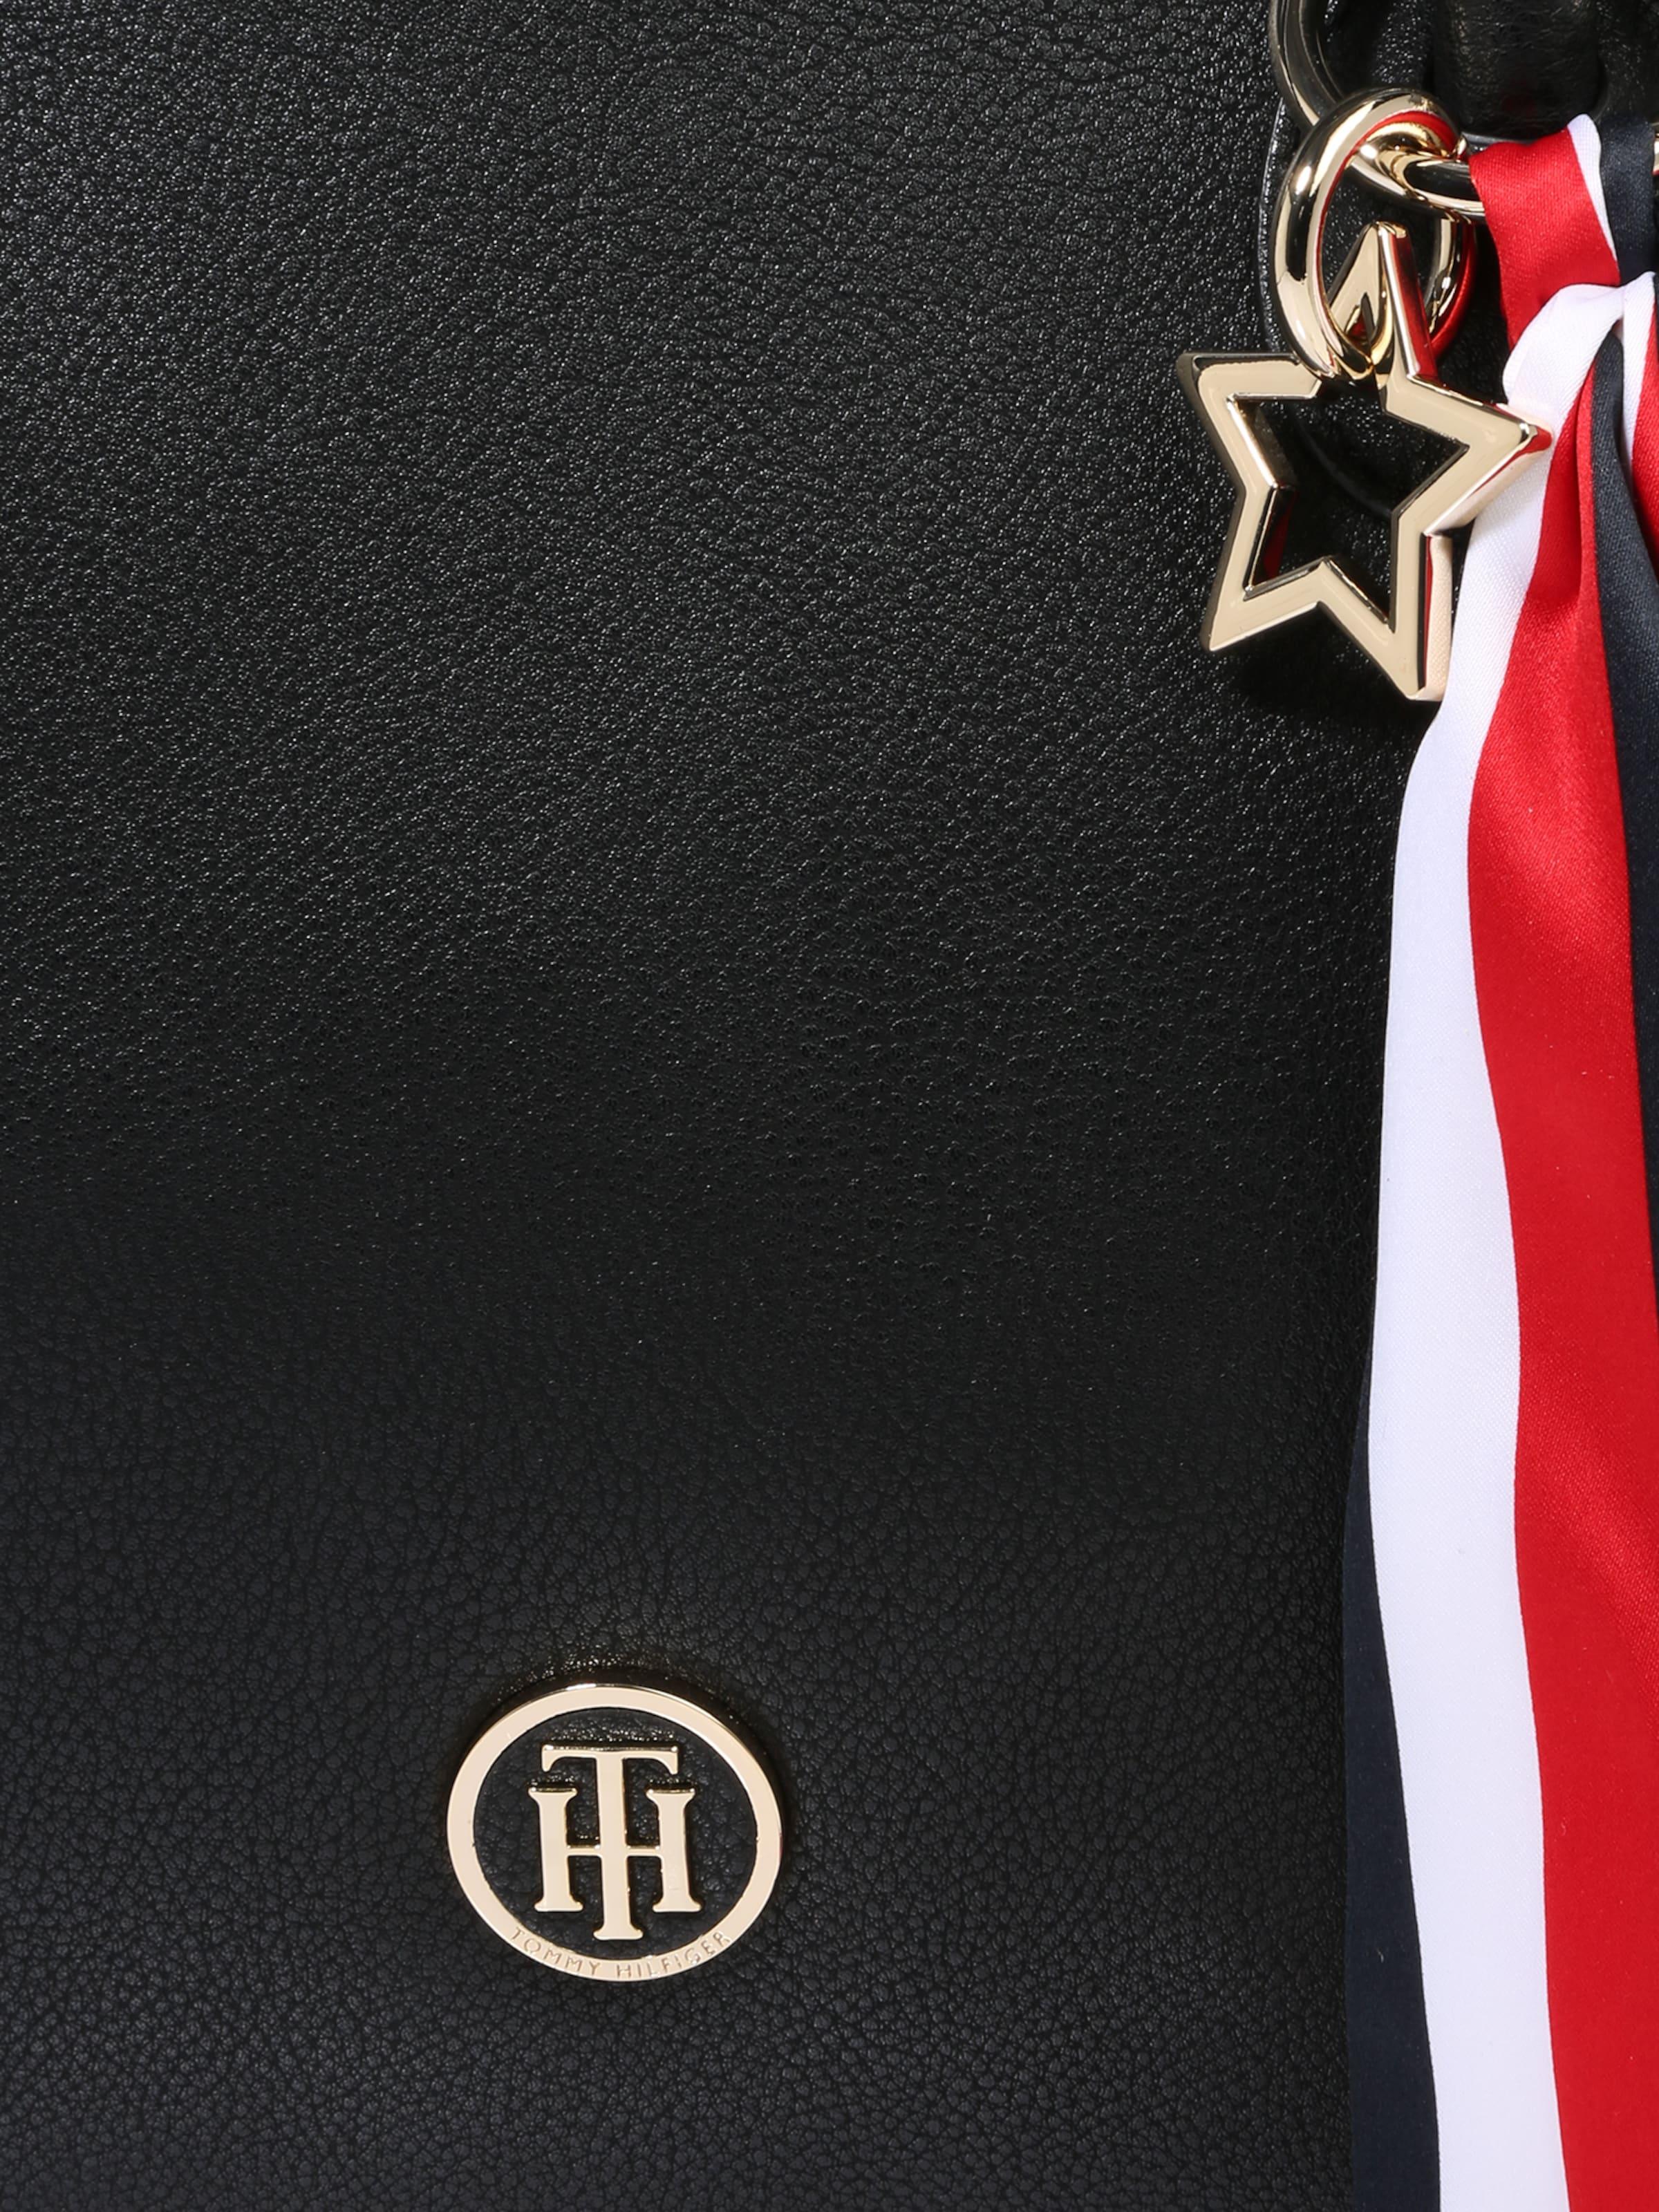 HILFIGER HILFIGER TOMMY' 'CHARMING TOMMY' HILFIGER TOMMY 'CHARMING Handtasche TOMMY TOMMY 'CHARMING Handtasche TOMMY TOMMY' Handtasche RqEPwA